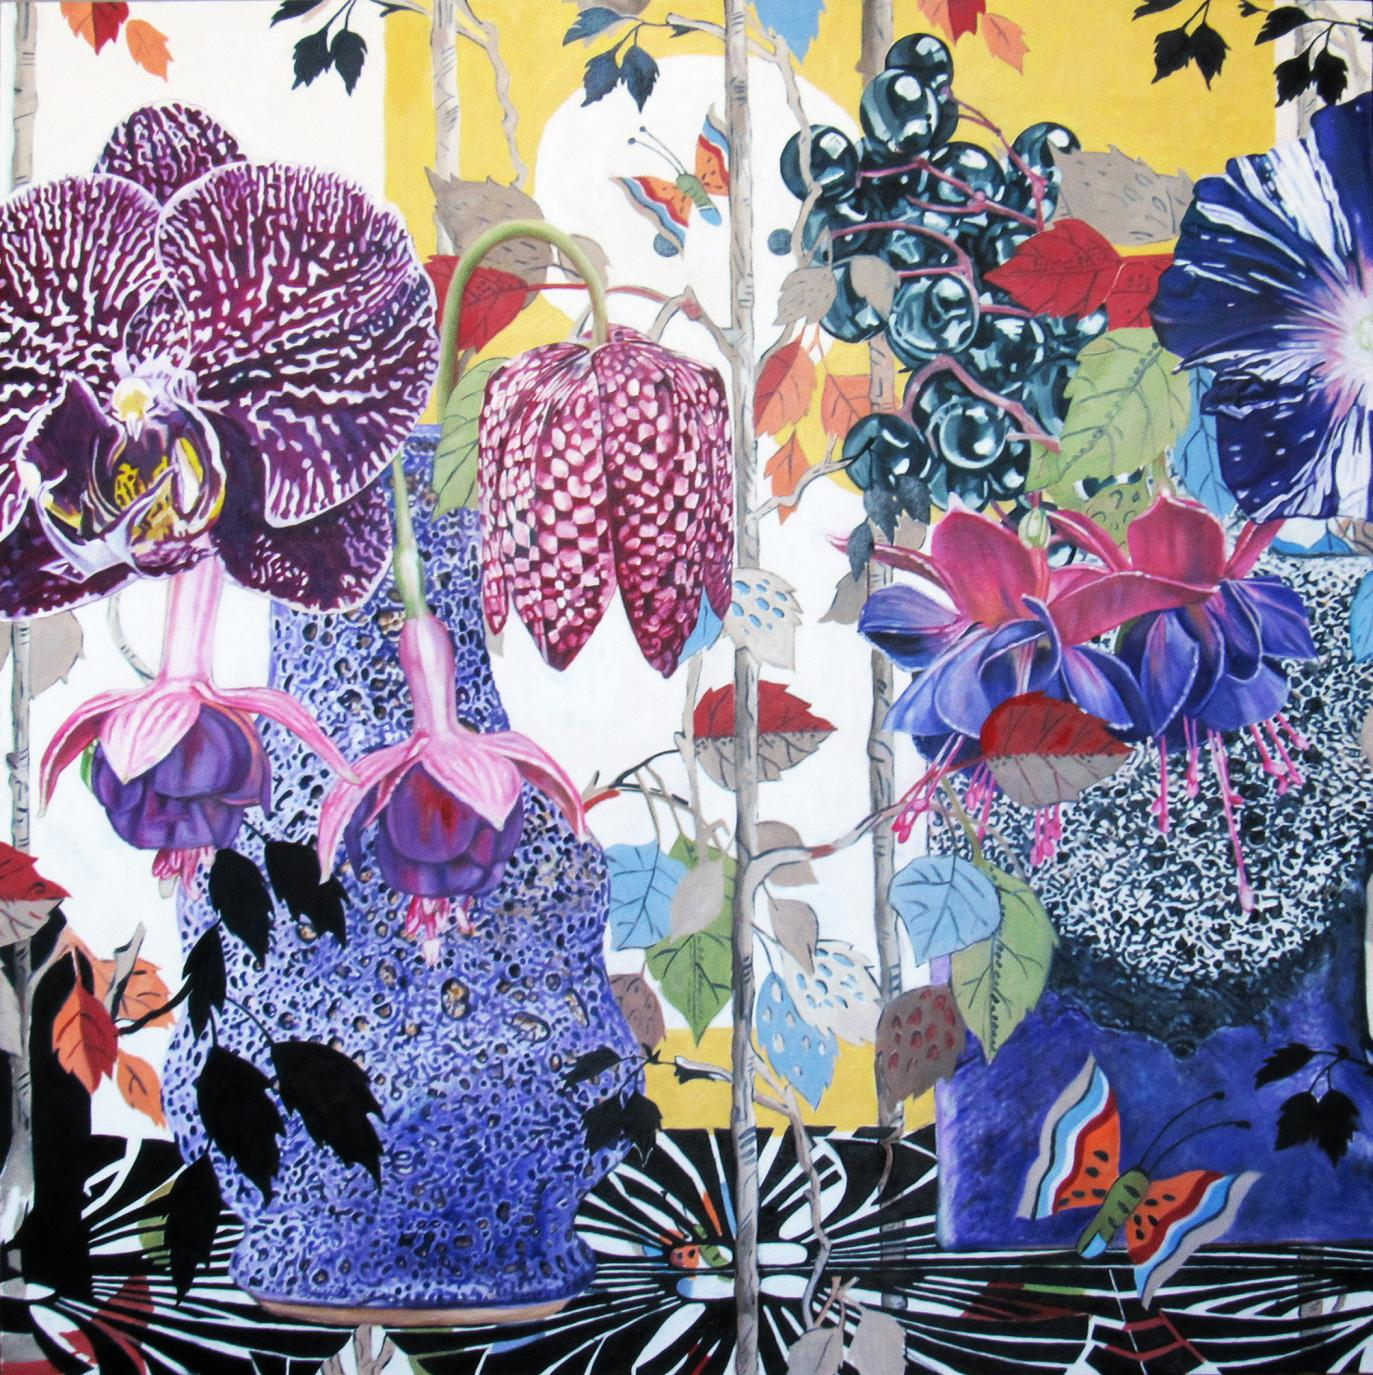 La Sombra (2020) - Eva Nordholt